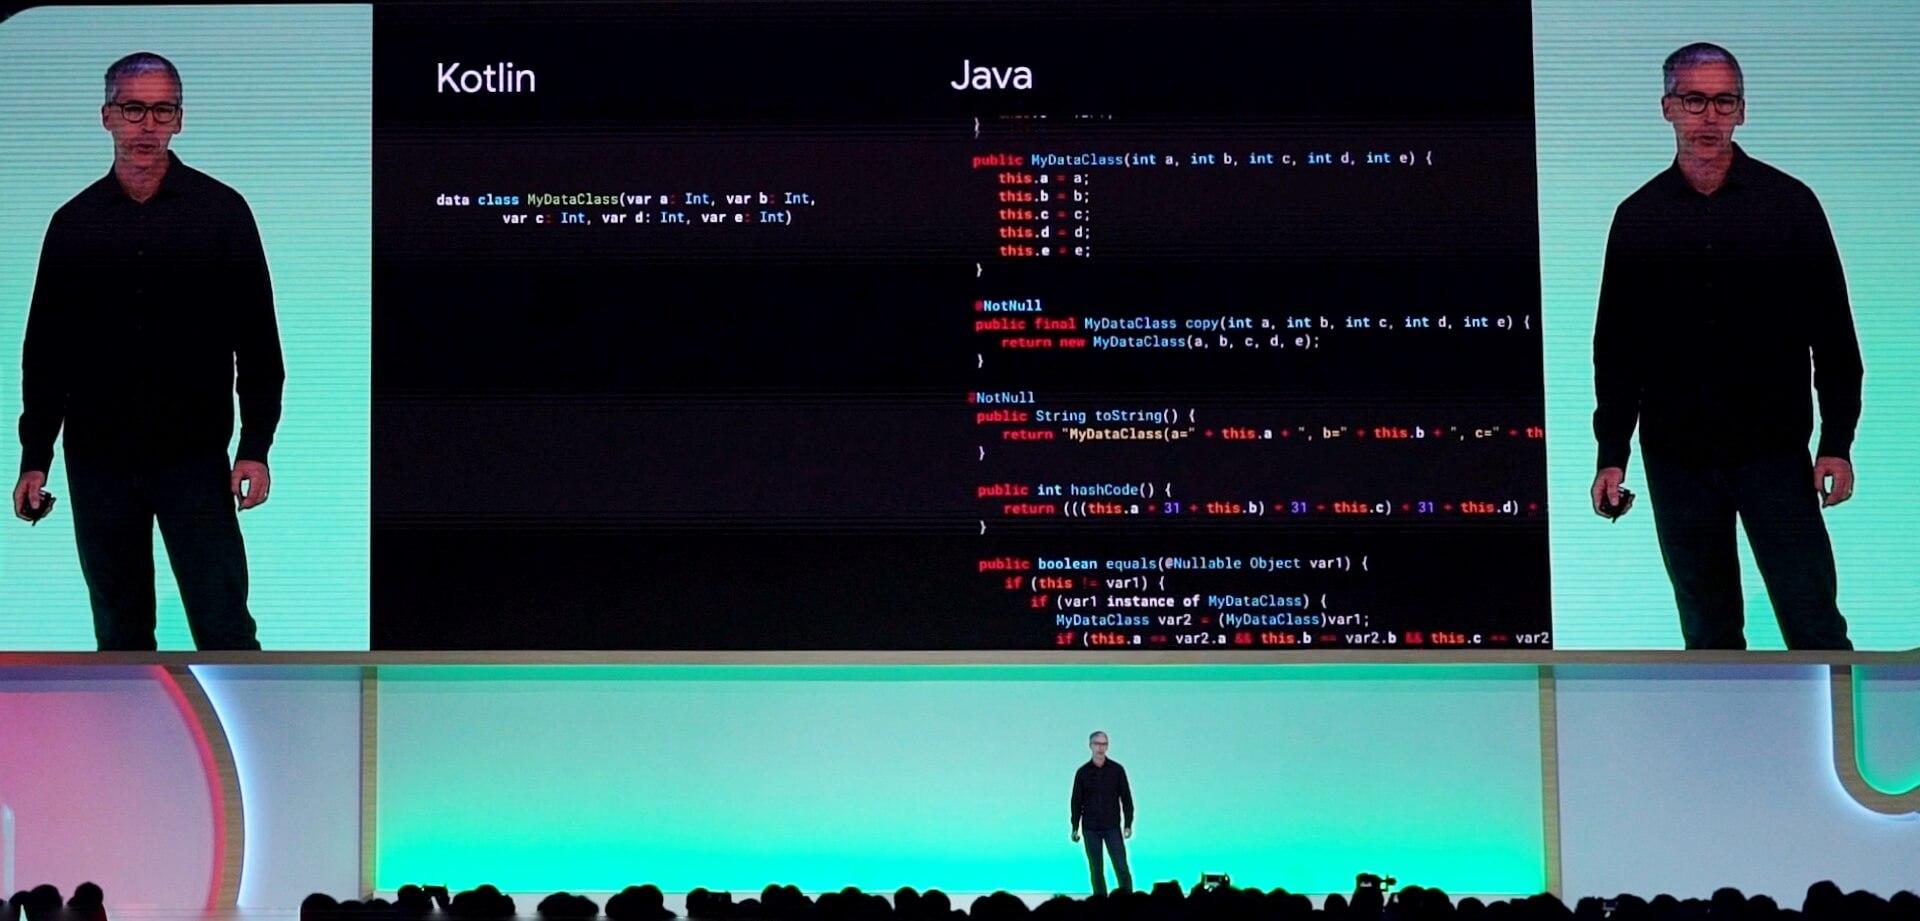 Kotlin语言的代码量比传统的Java少很多 澎湃新闻记者 孙懿赟 图